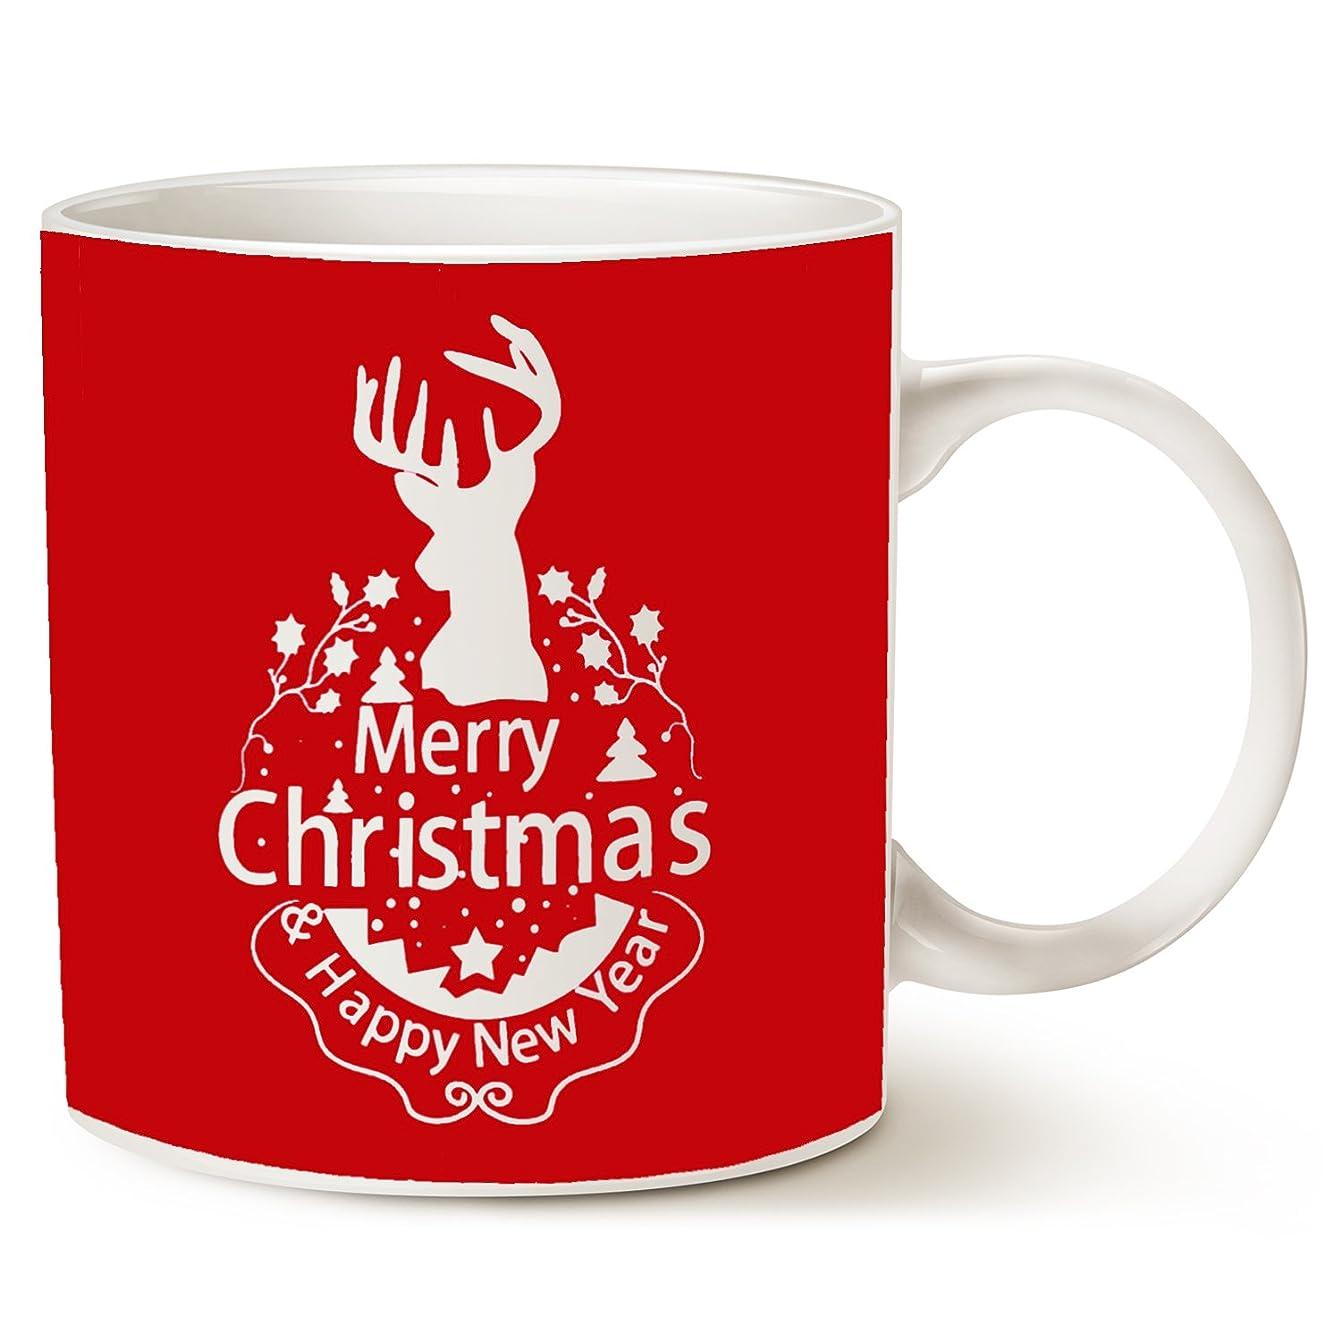 Christmas Gifts Holiday Coffee Mug, Wish You a Merry Christmas and Happy New Year Rangifer Tarandus Ceramic Cup, Red 14Oz